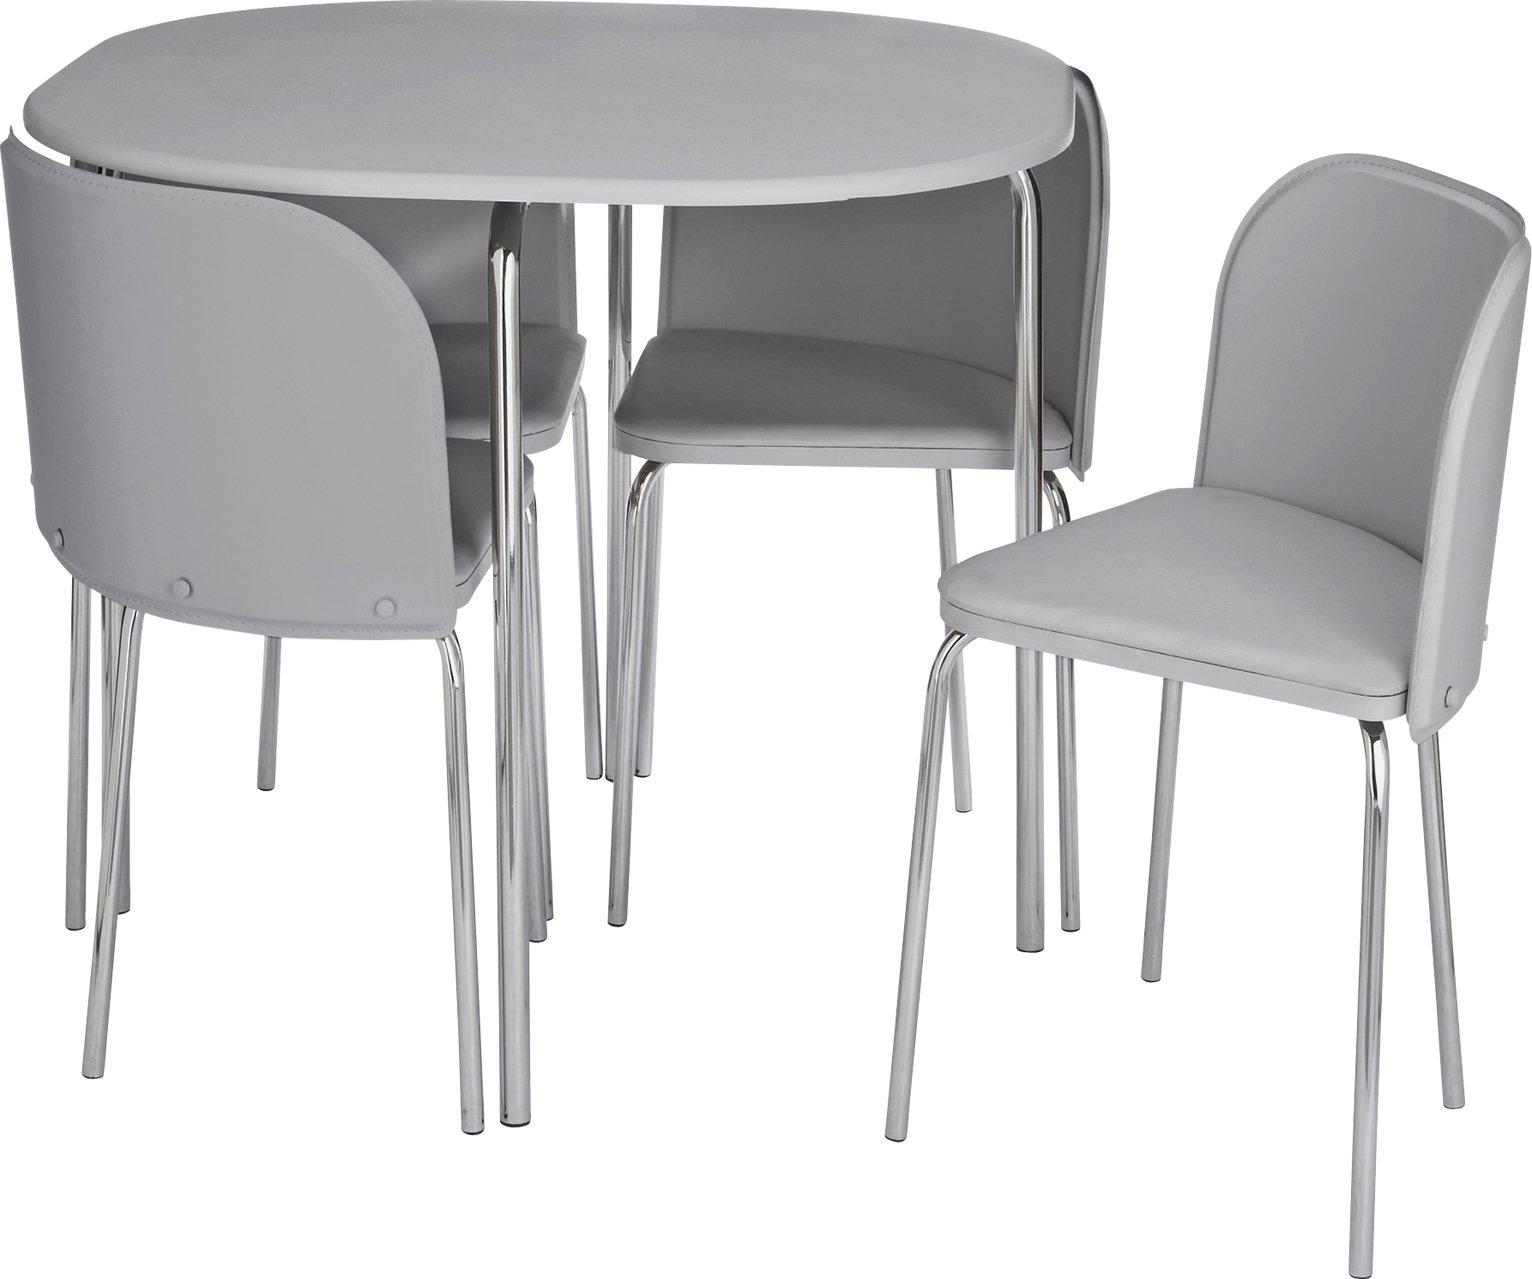 Argos Home Amparo Dining Table Chairs White